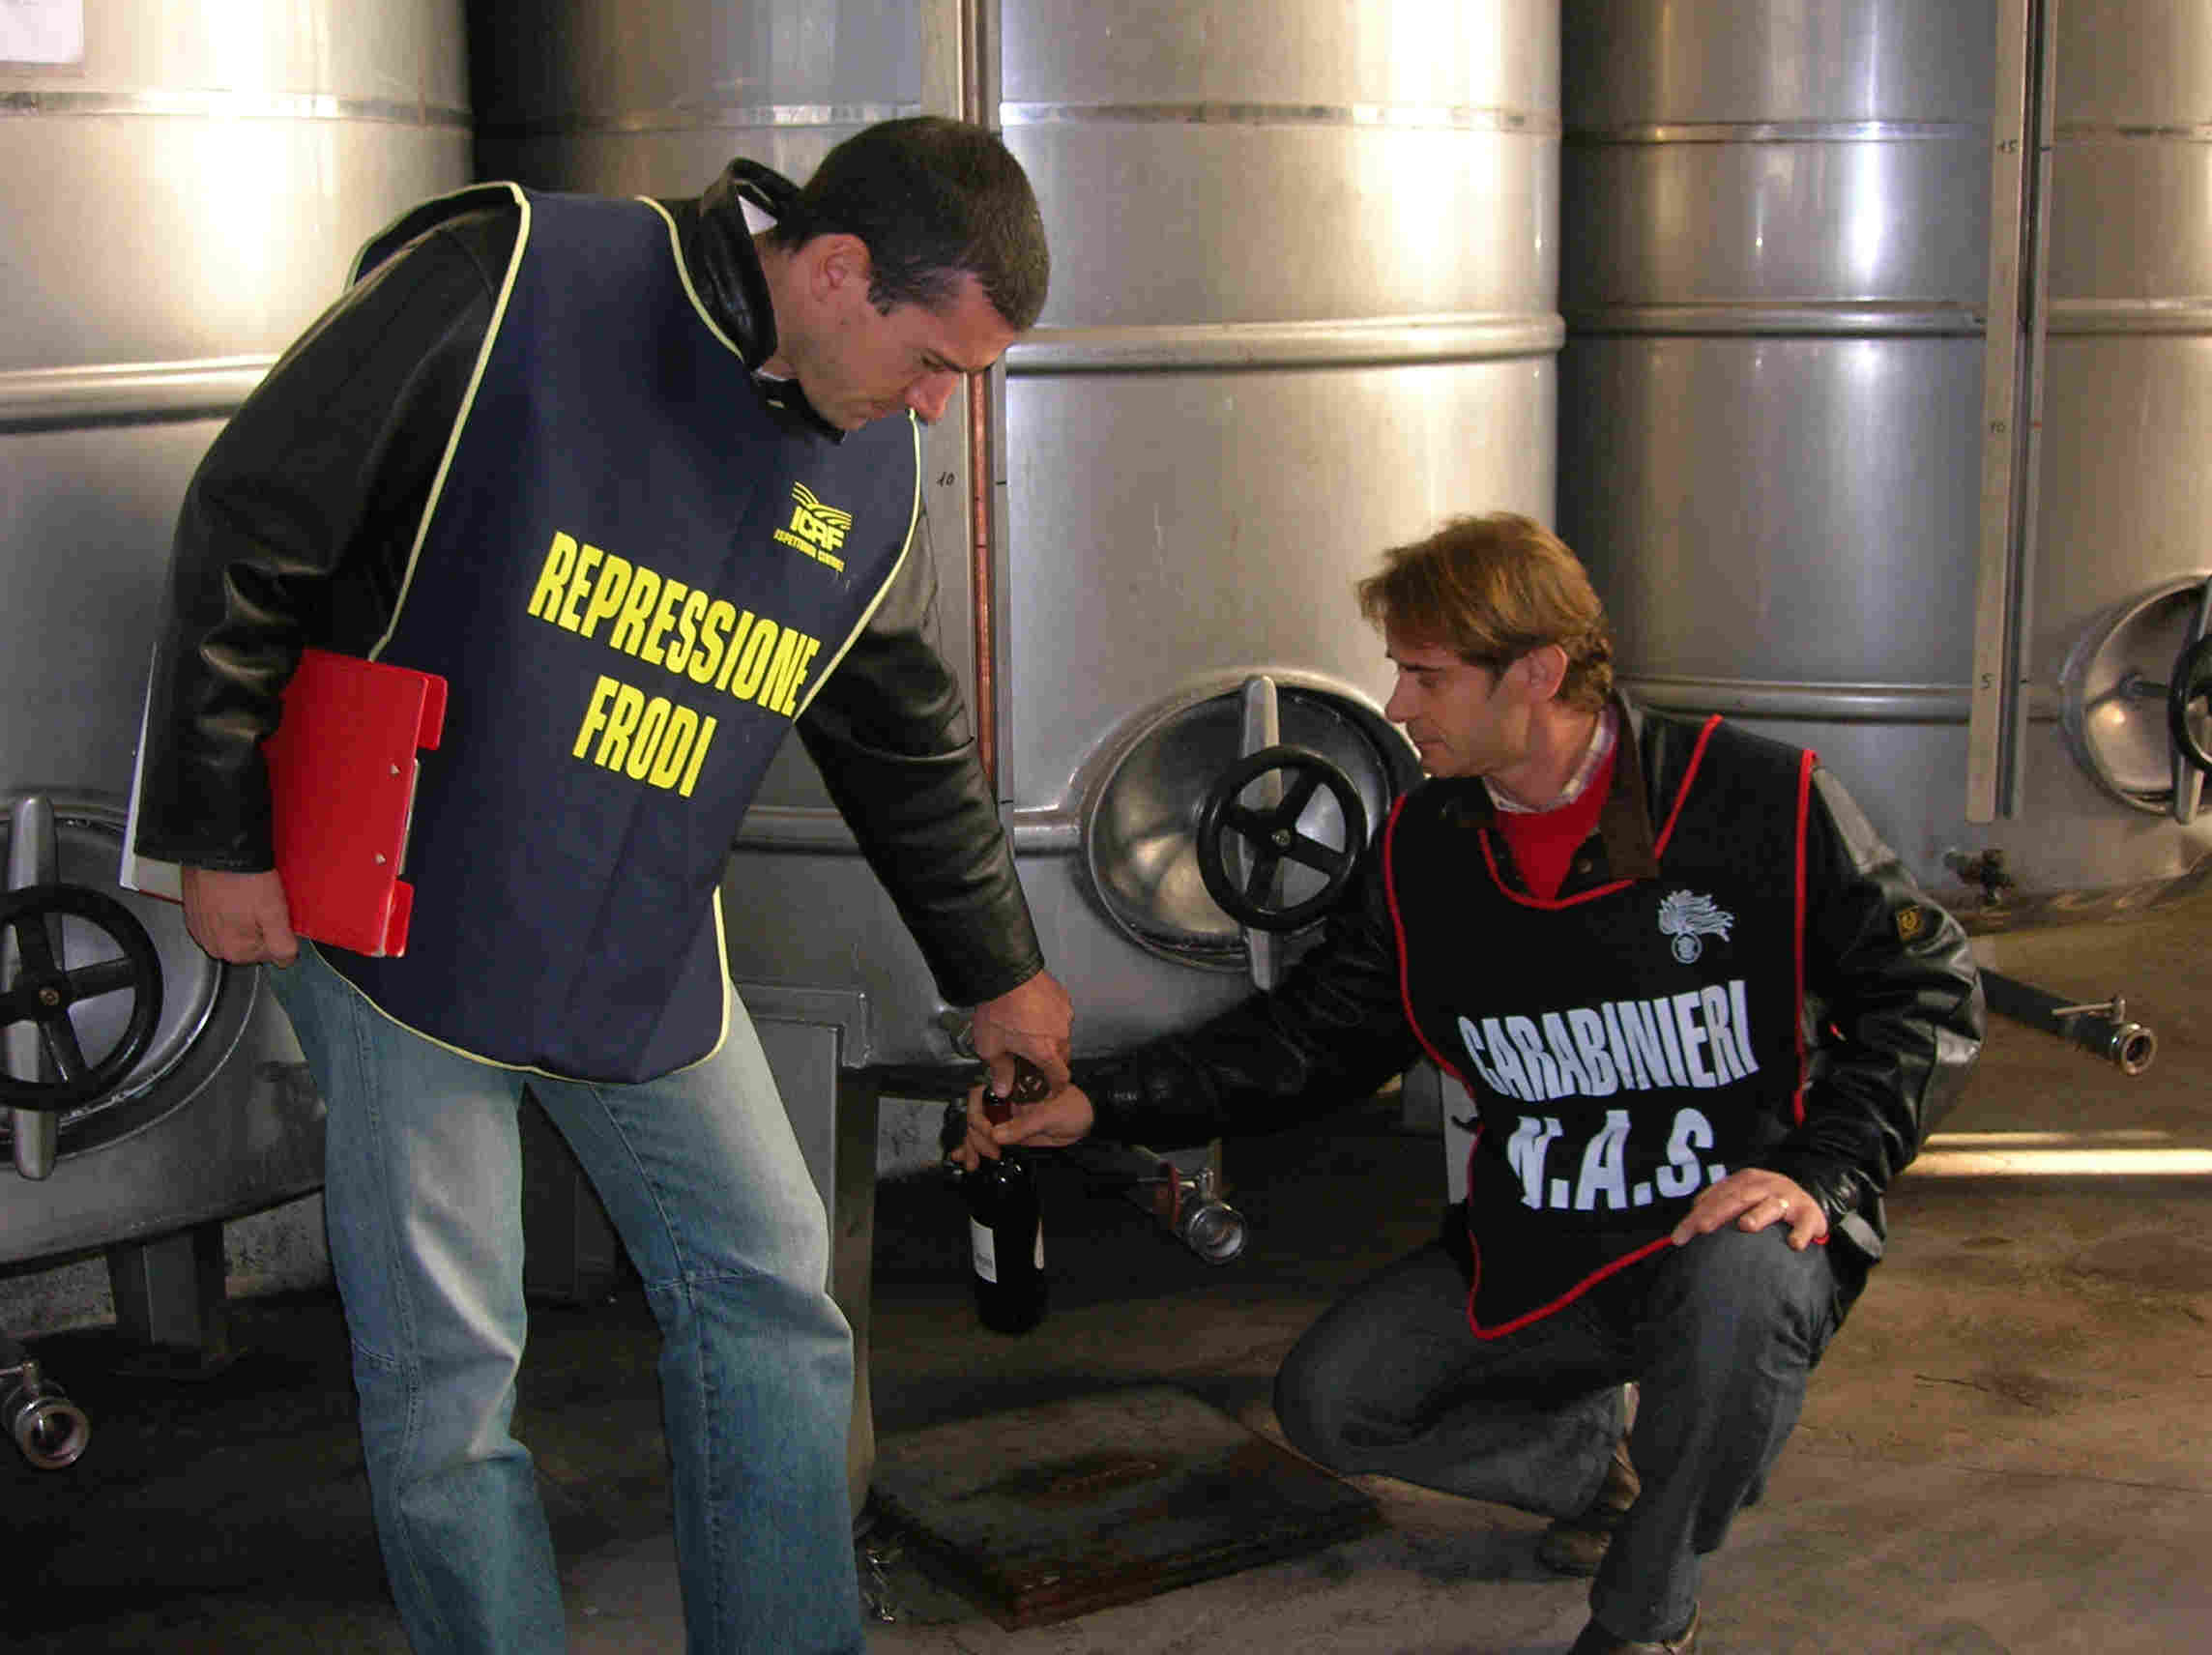 Frode olio, arresti in Toscana e Puglia